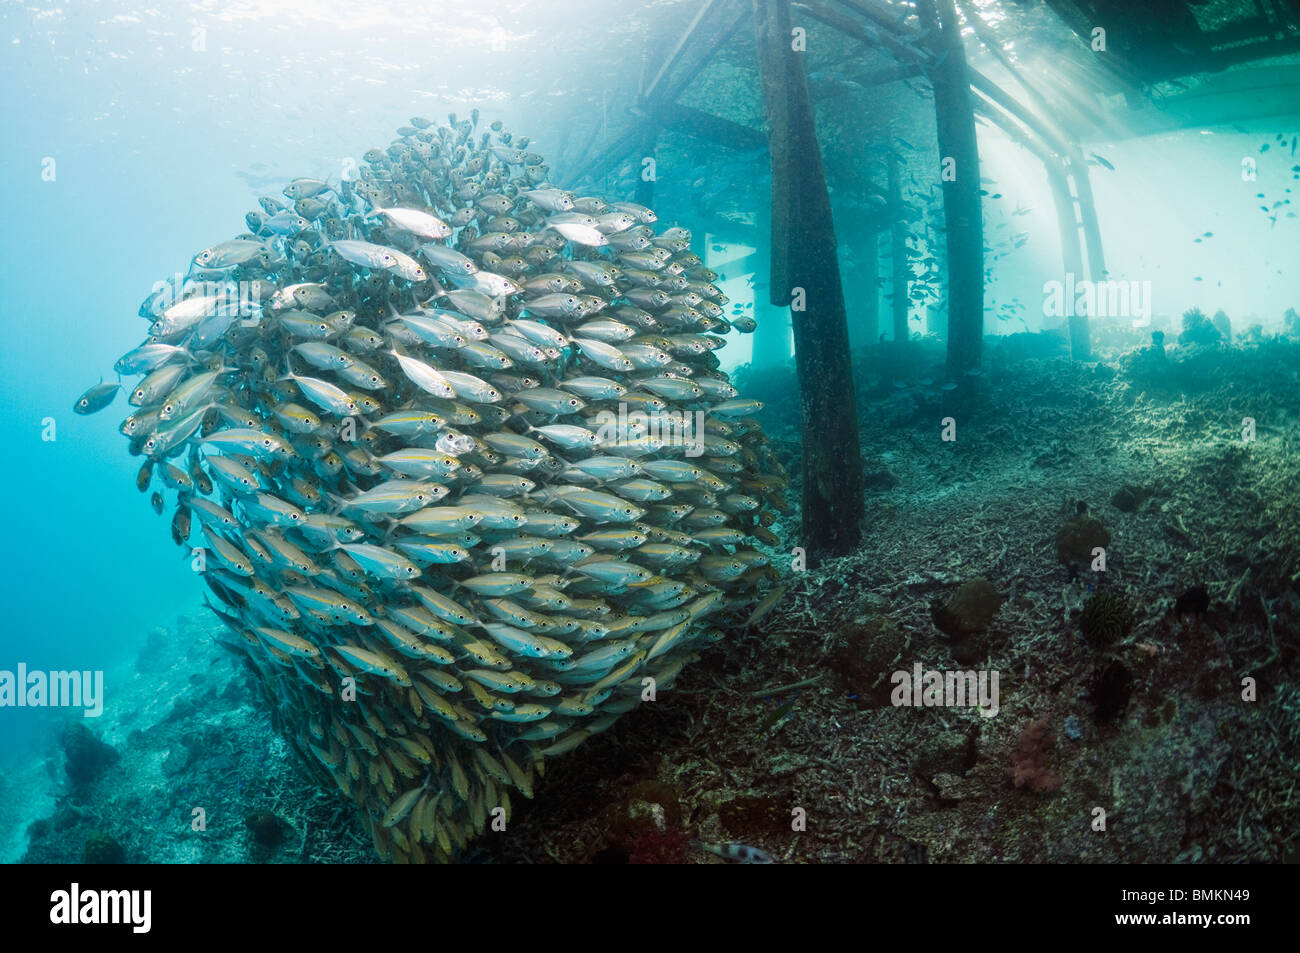 Bigeye scad school with jetty on coral reef.  Misool, Raja Empat, West Papua, Indonesia. - Stock Image